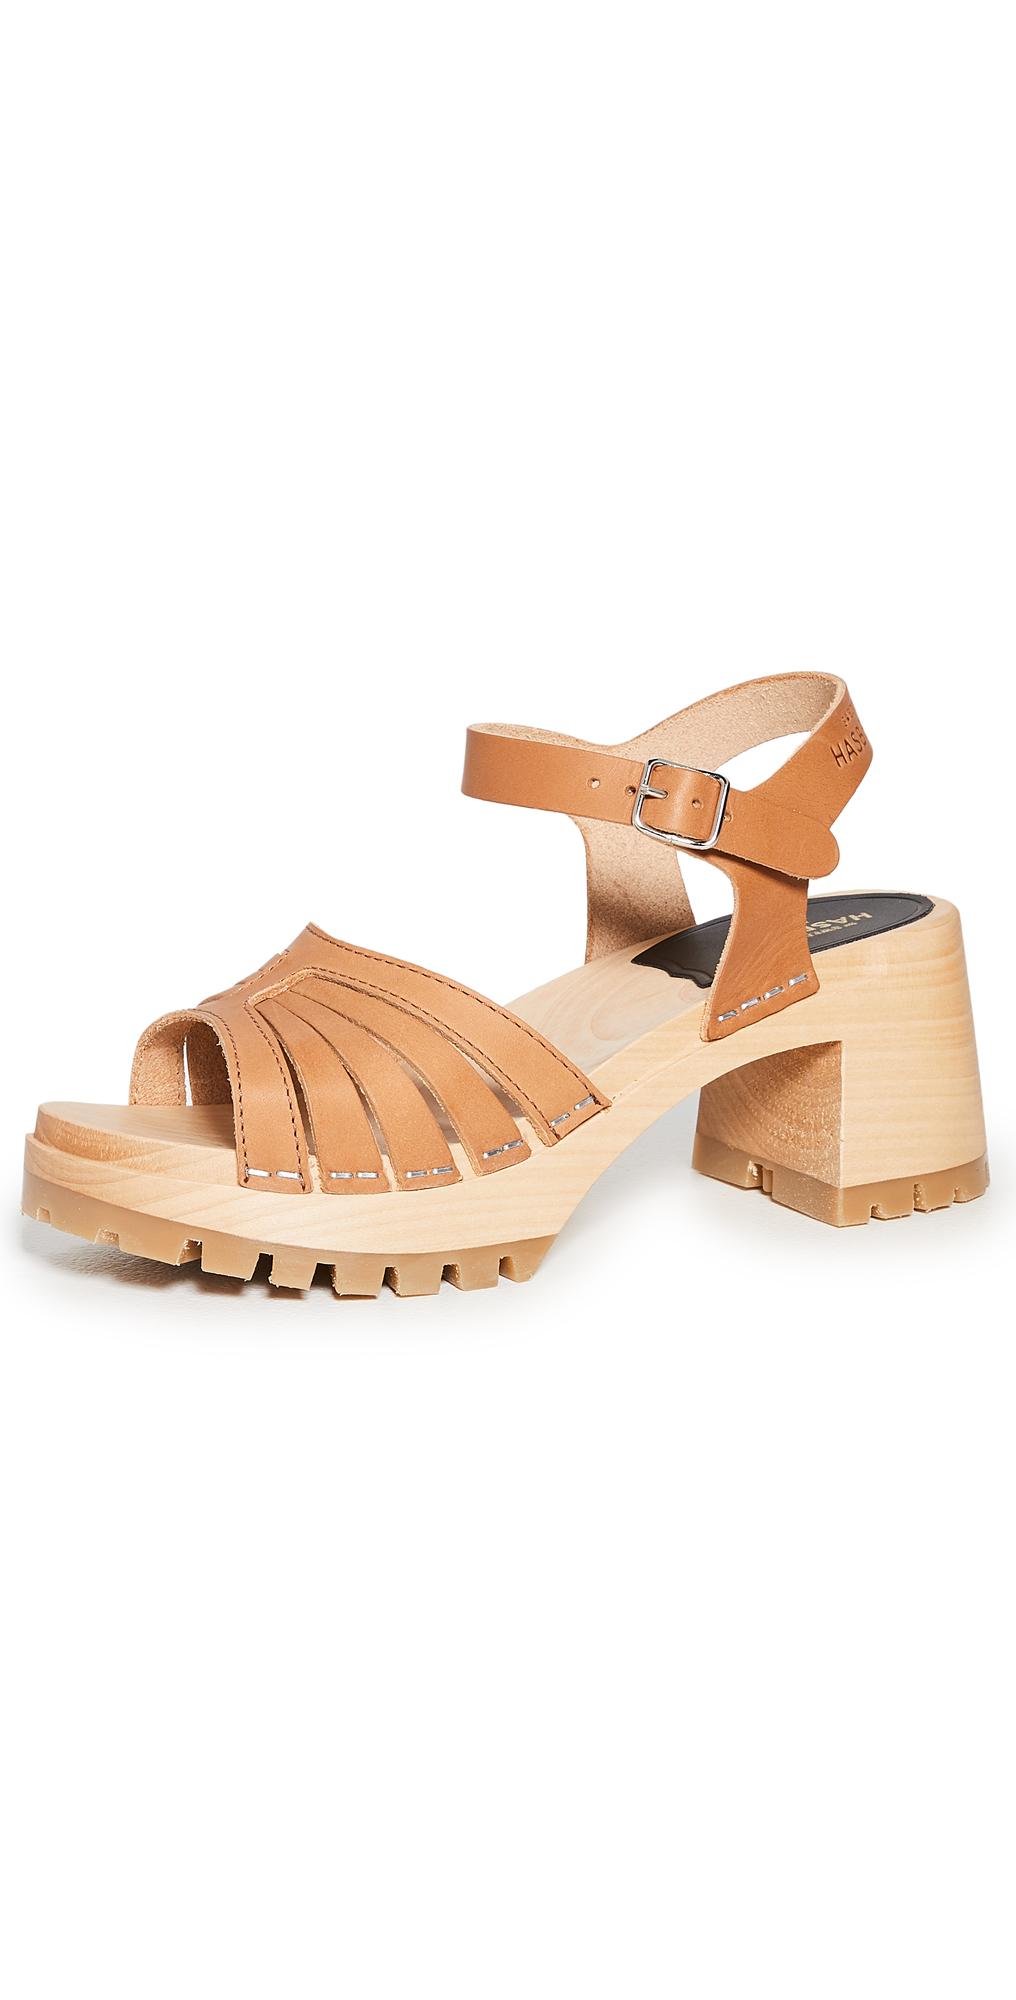 Swedish Hasbeens Strap High Sandals